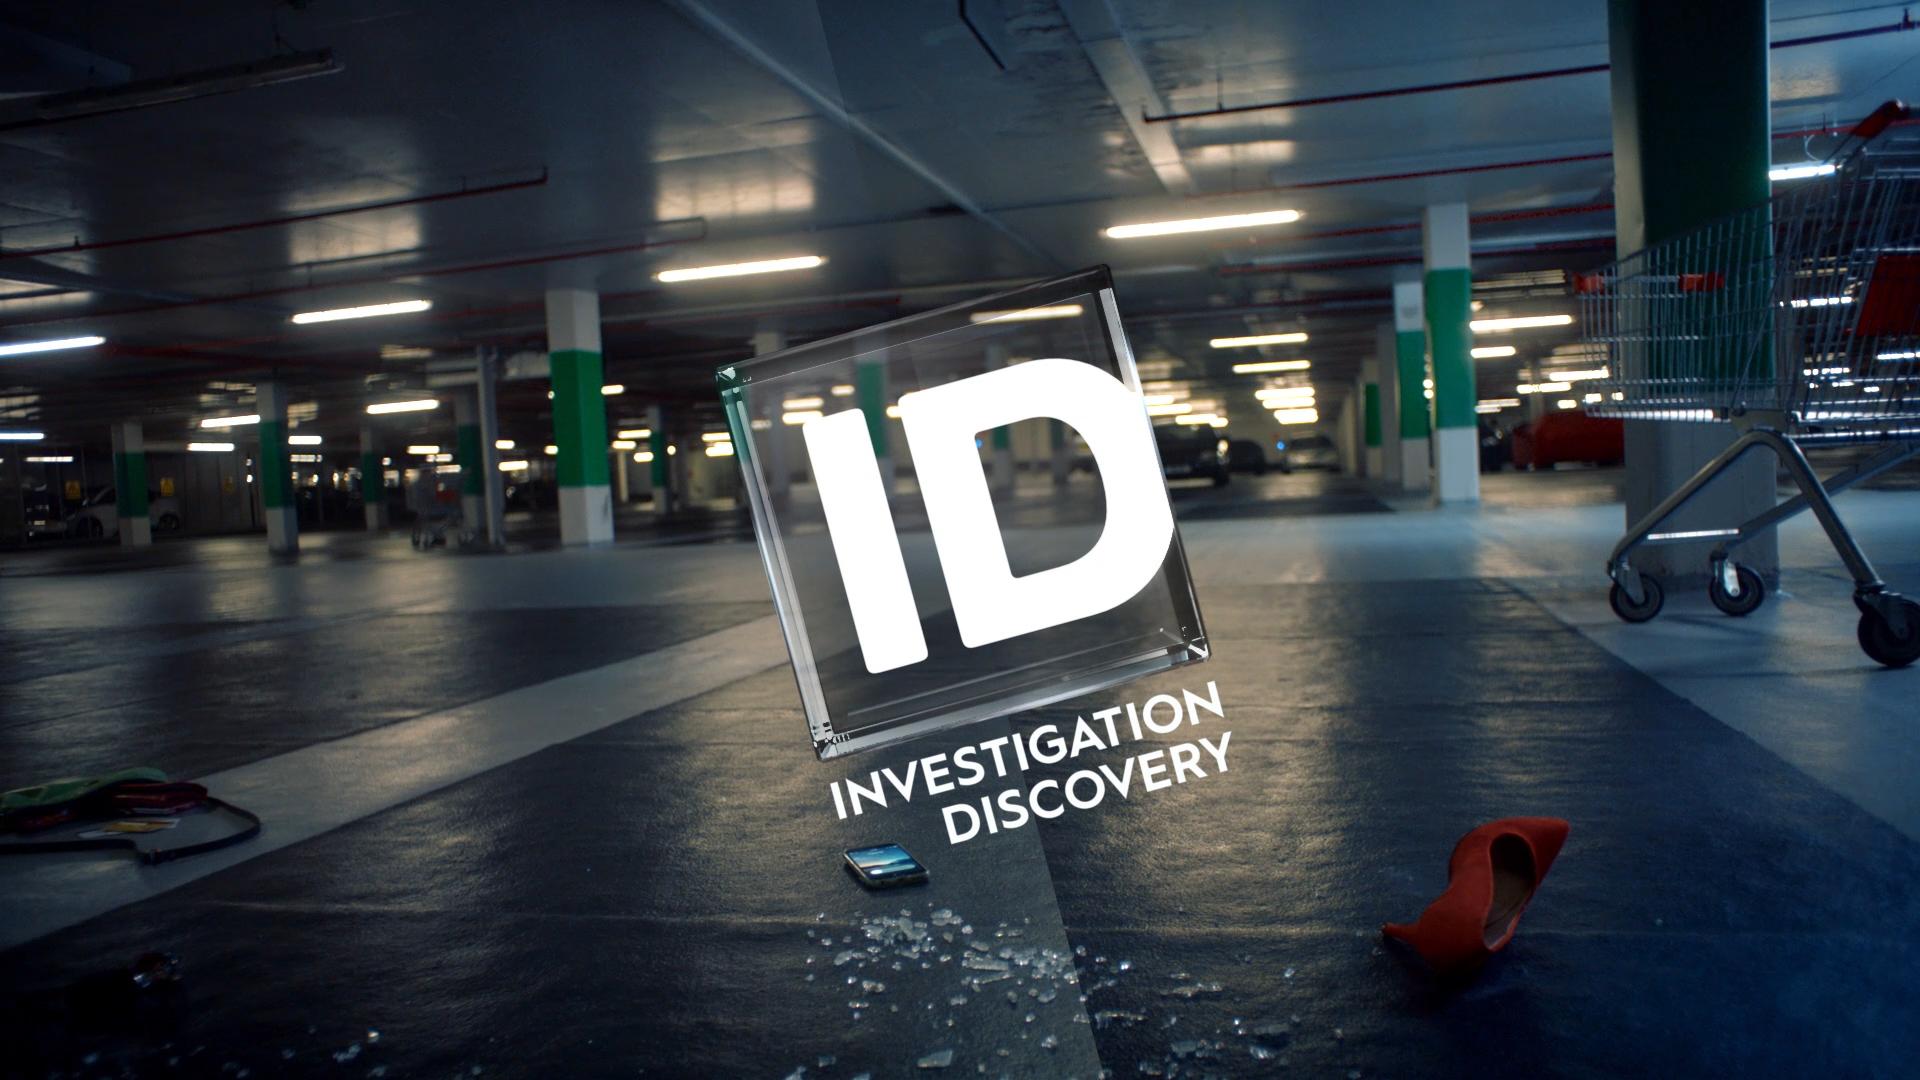 ID_Idents_Carpark_Gen_15+5_00434